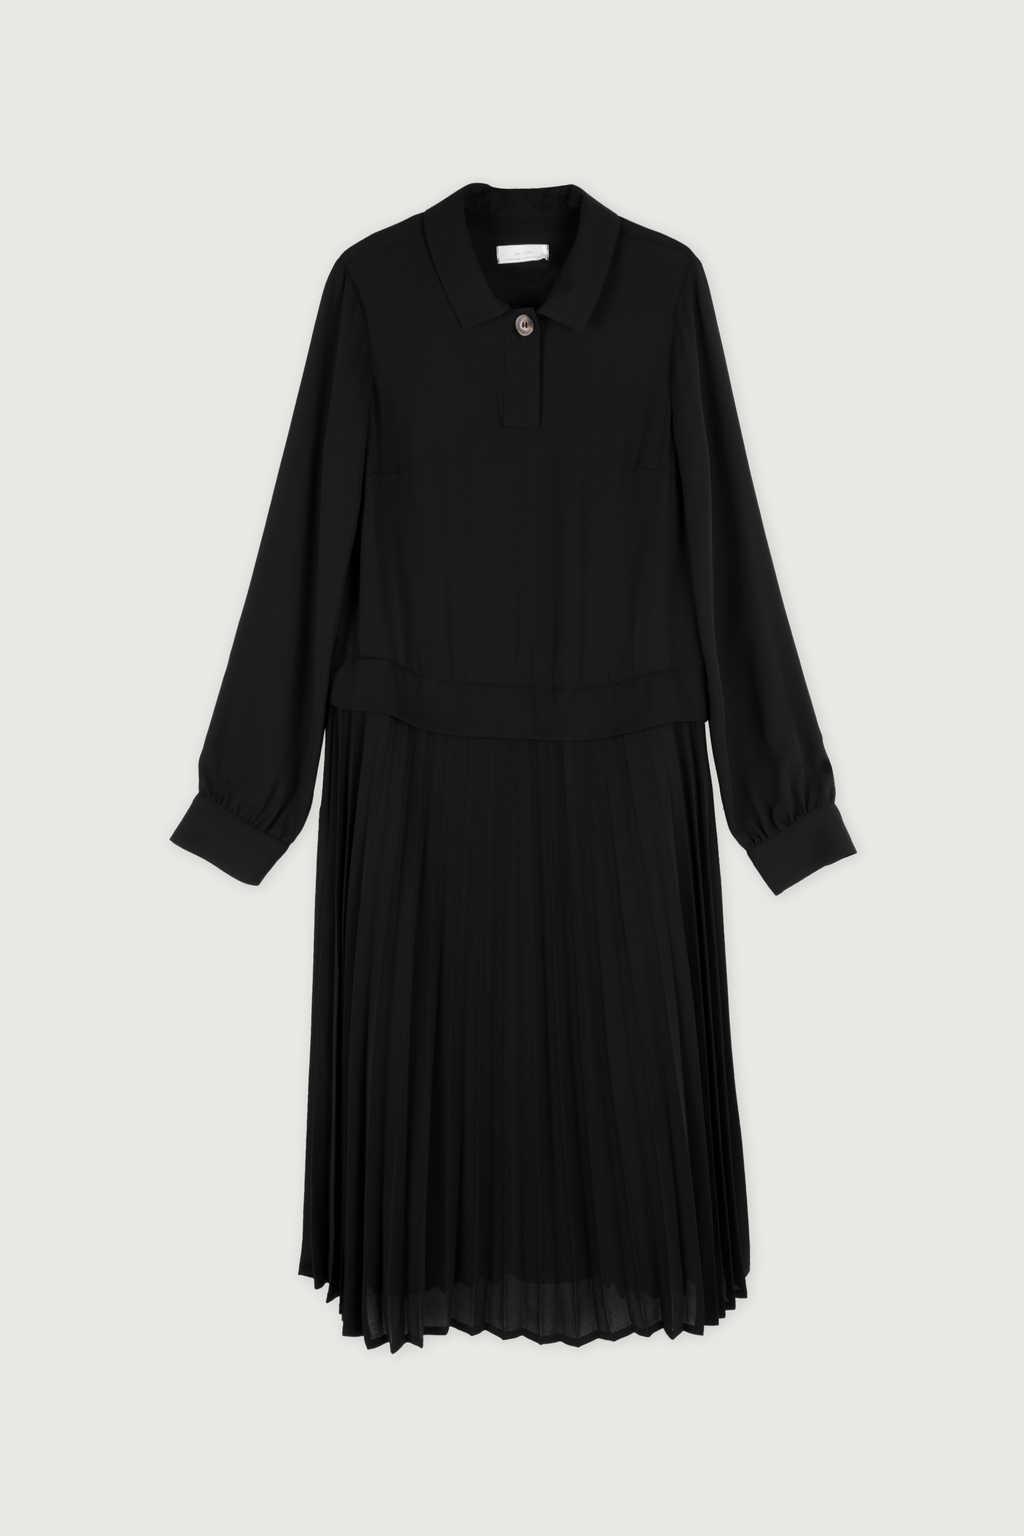 Dress 3393 Black 14